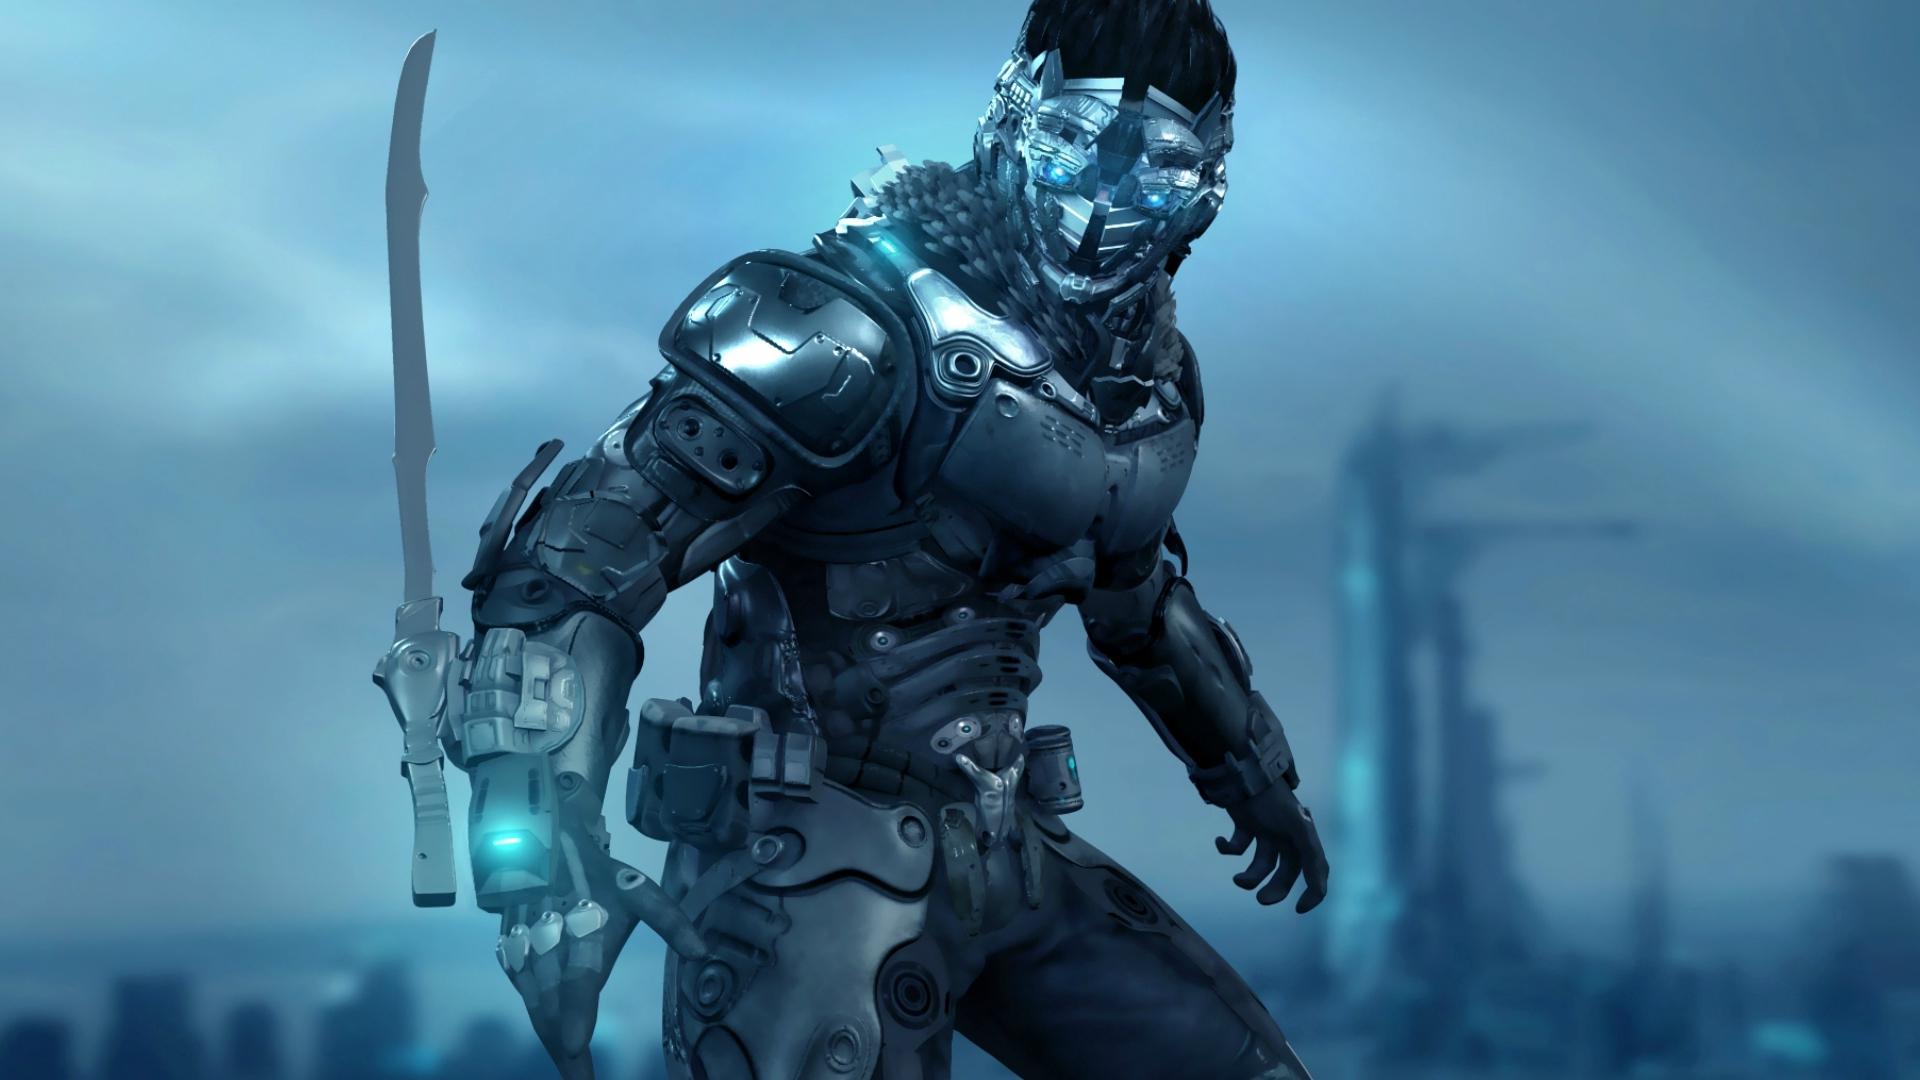 Cyberpunk Mask free download wallpaper